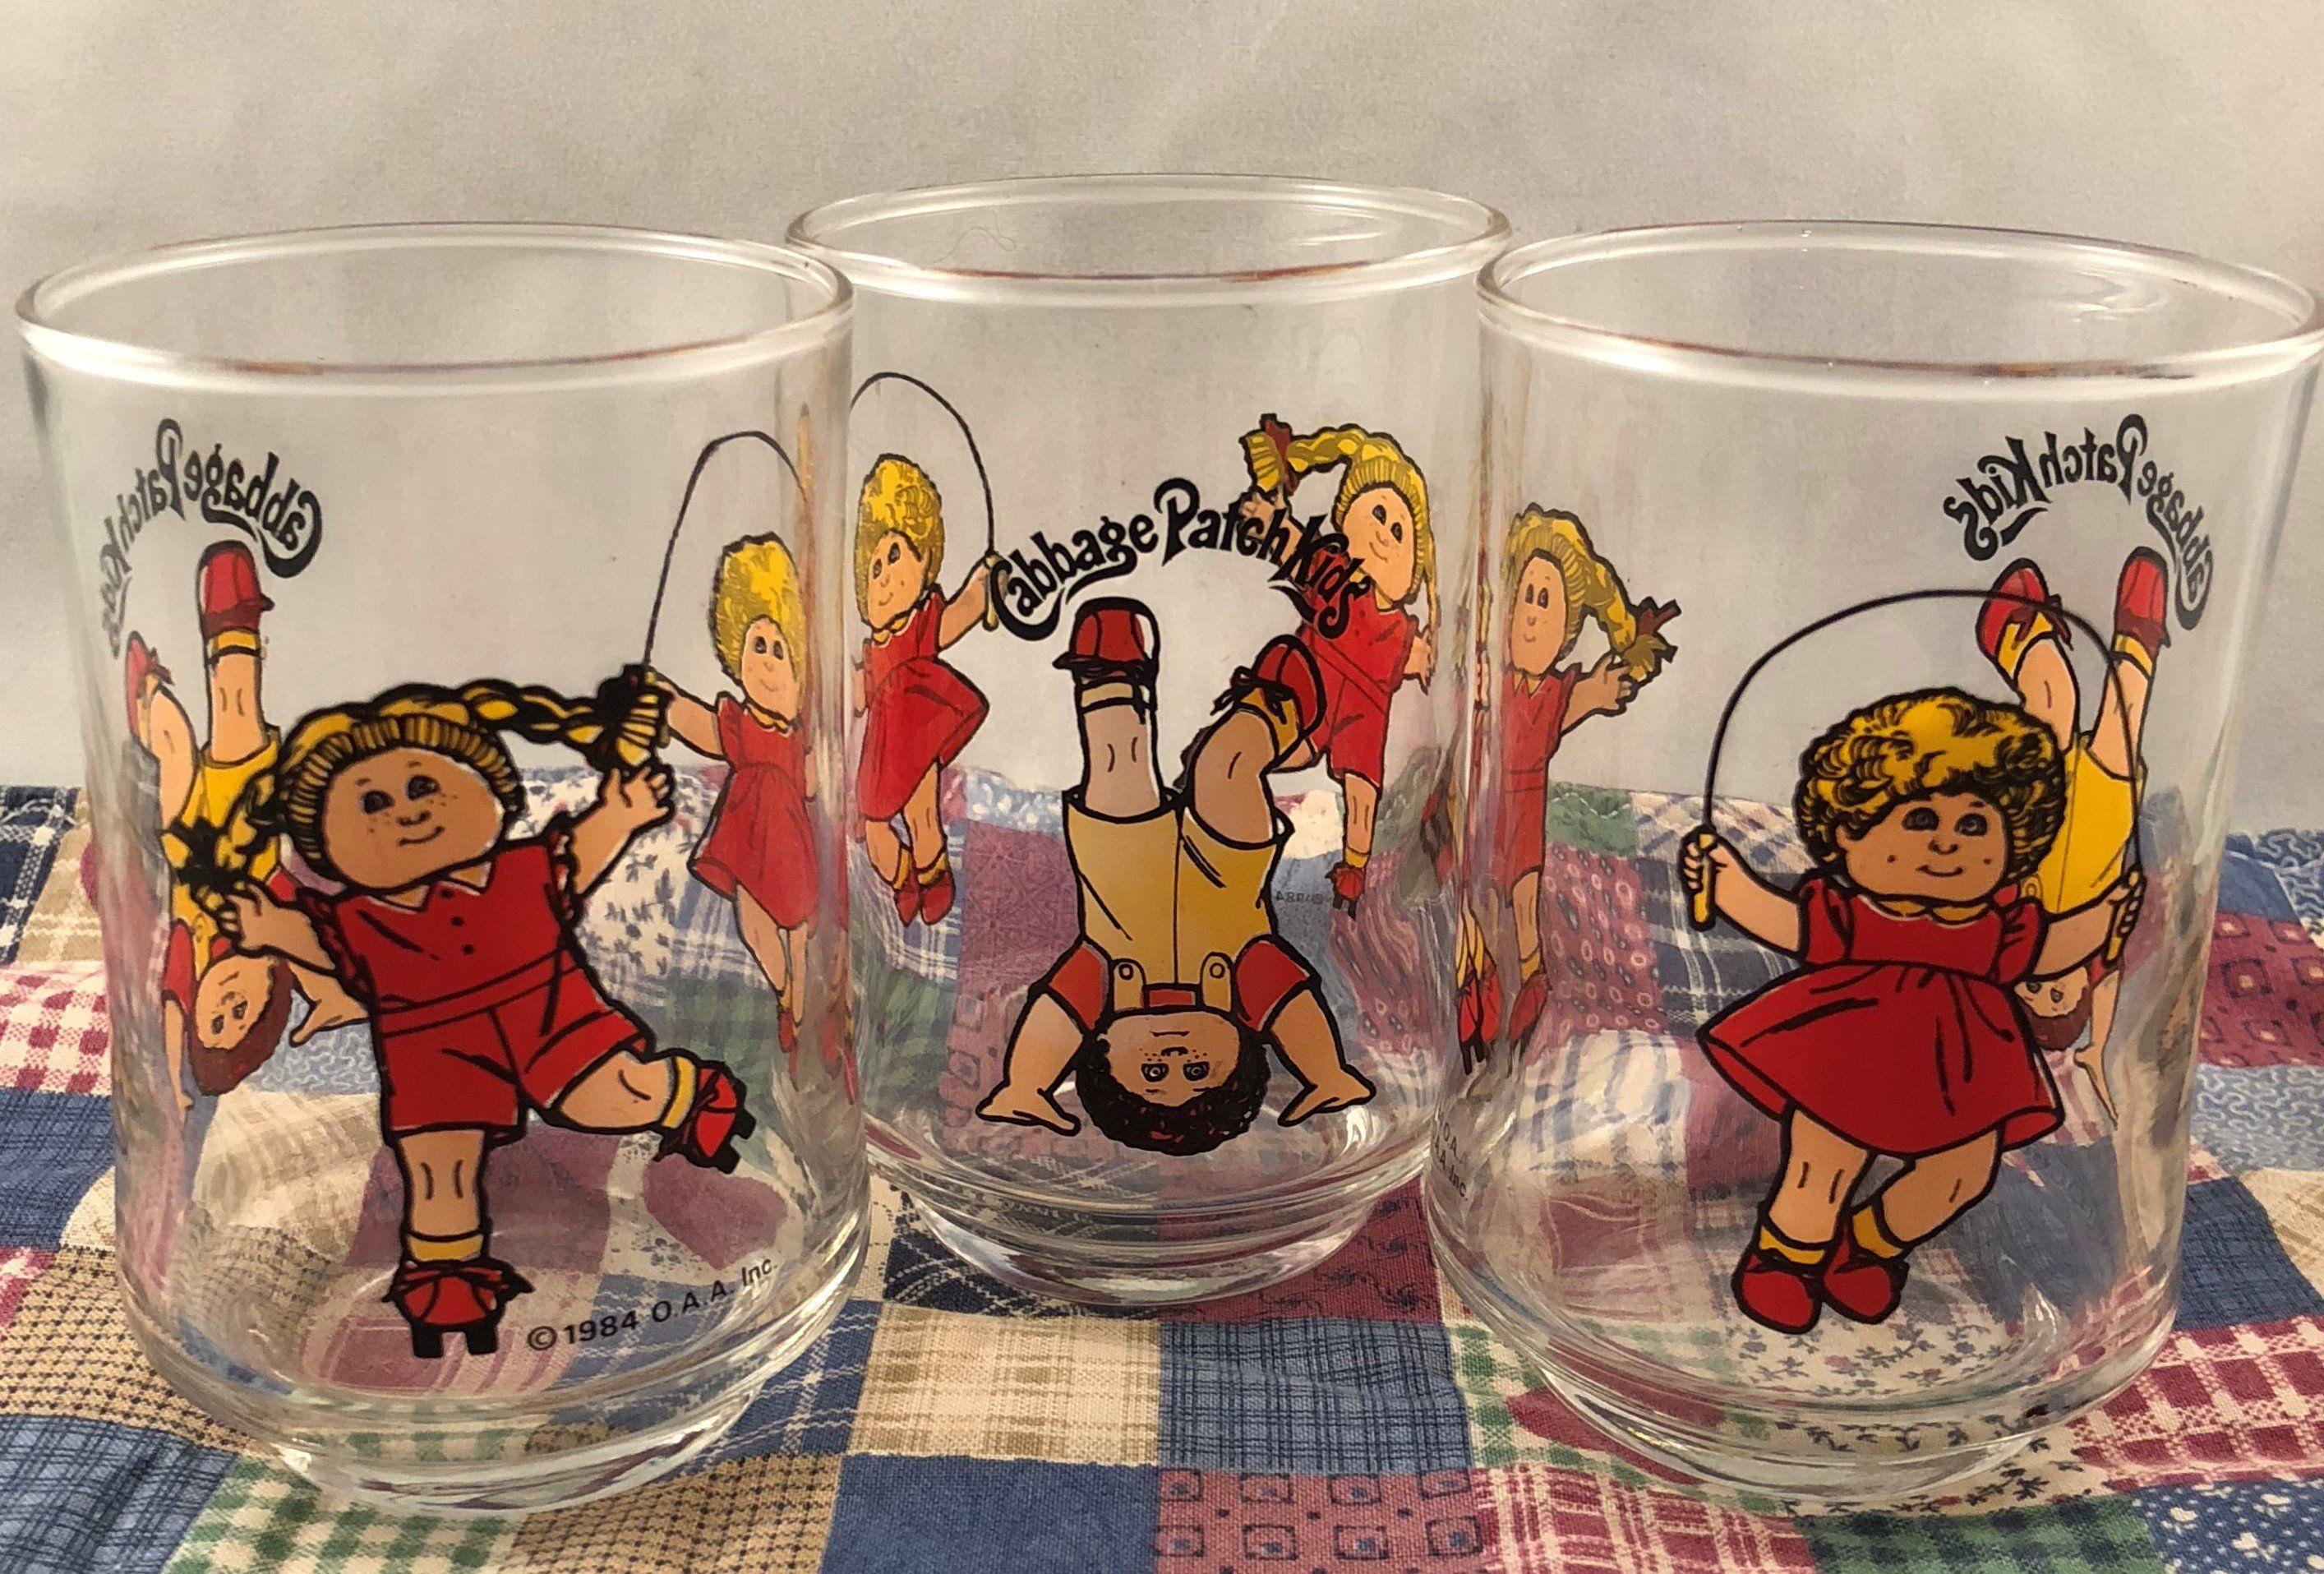 Set Of Three 1984 Cabbage Patch Kids 4 Oz Juice Glasses Cabbage Patch Kids Kids Glasses Jump Rope